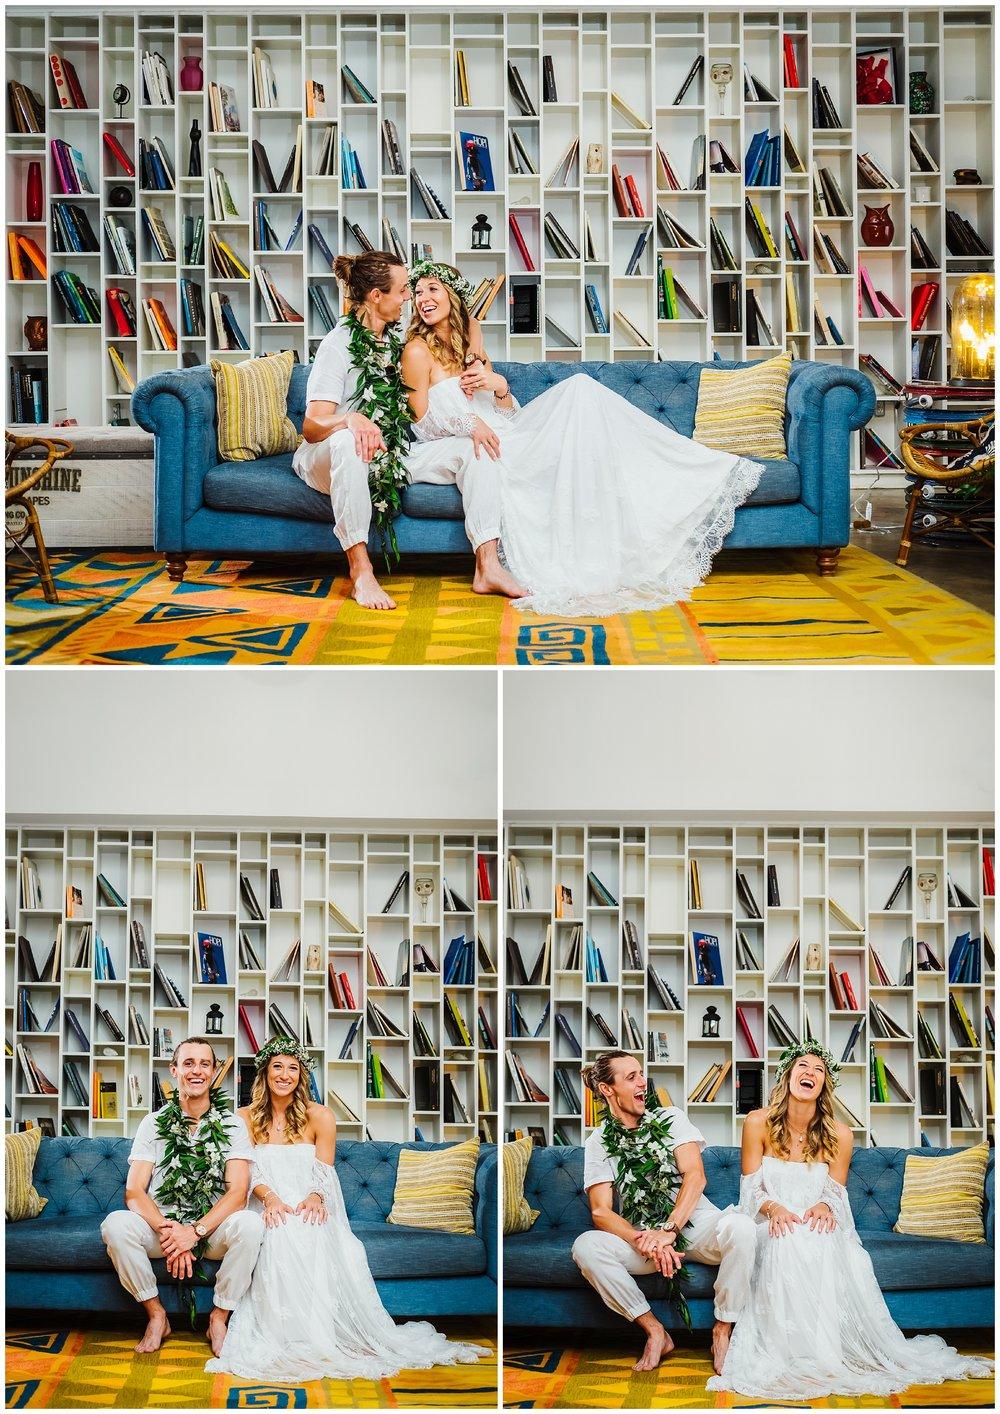 tampa-bay-wedding-photographer-barefoot-post-card-inn-tropical-hawaiin-lei-pink-pineapples-flower-crown_0146.jpg